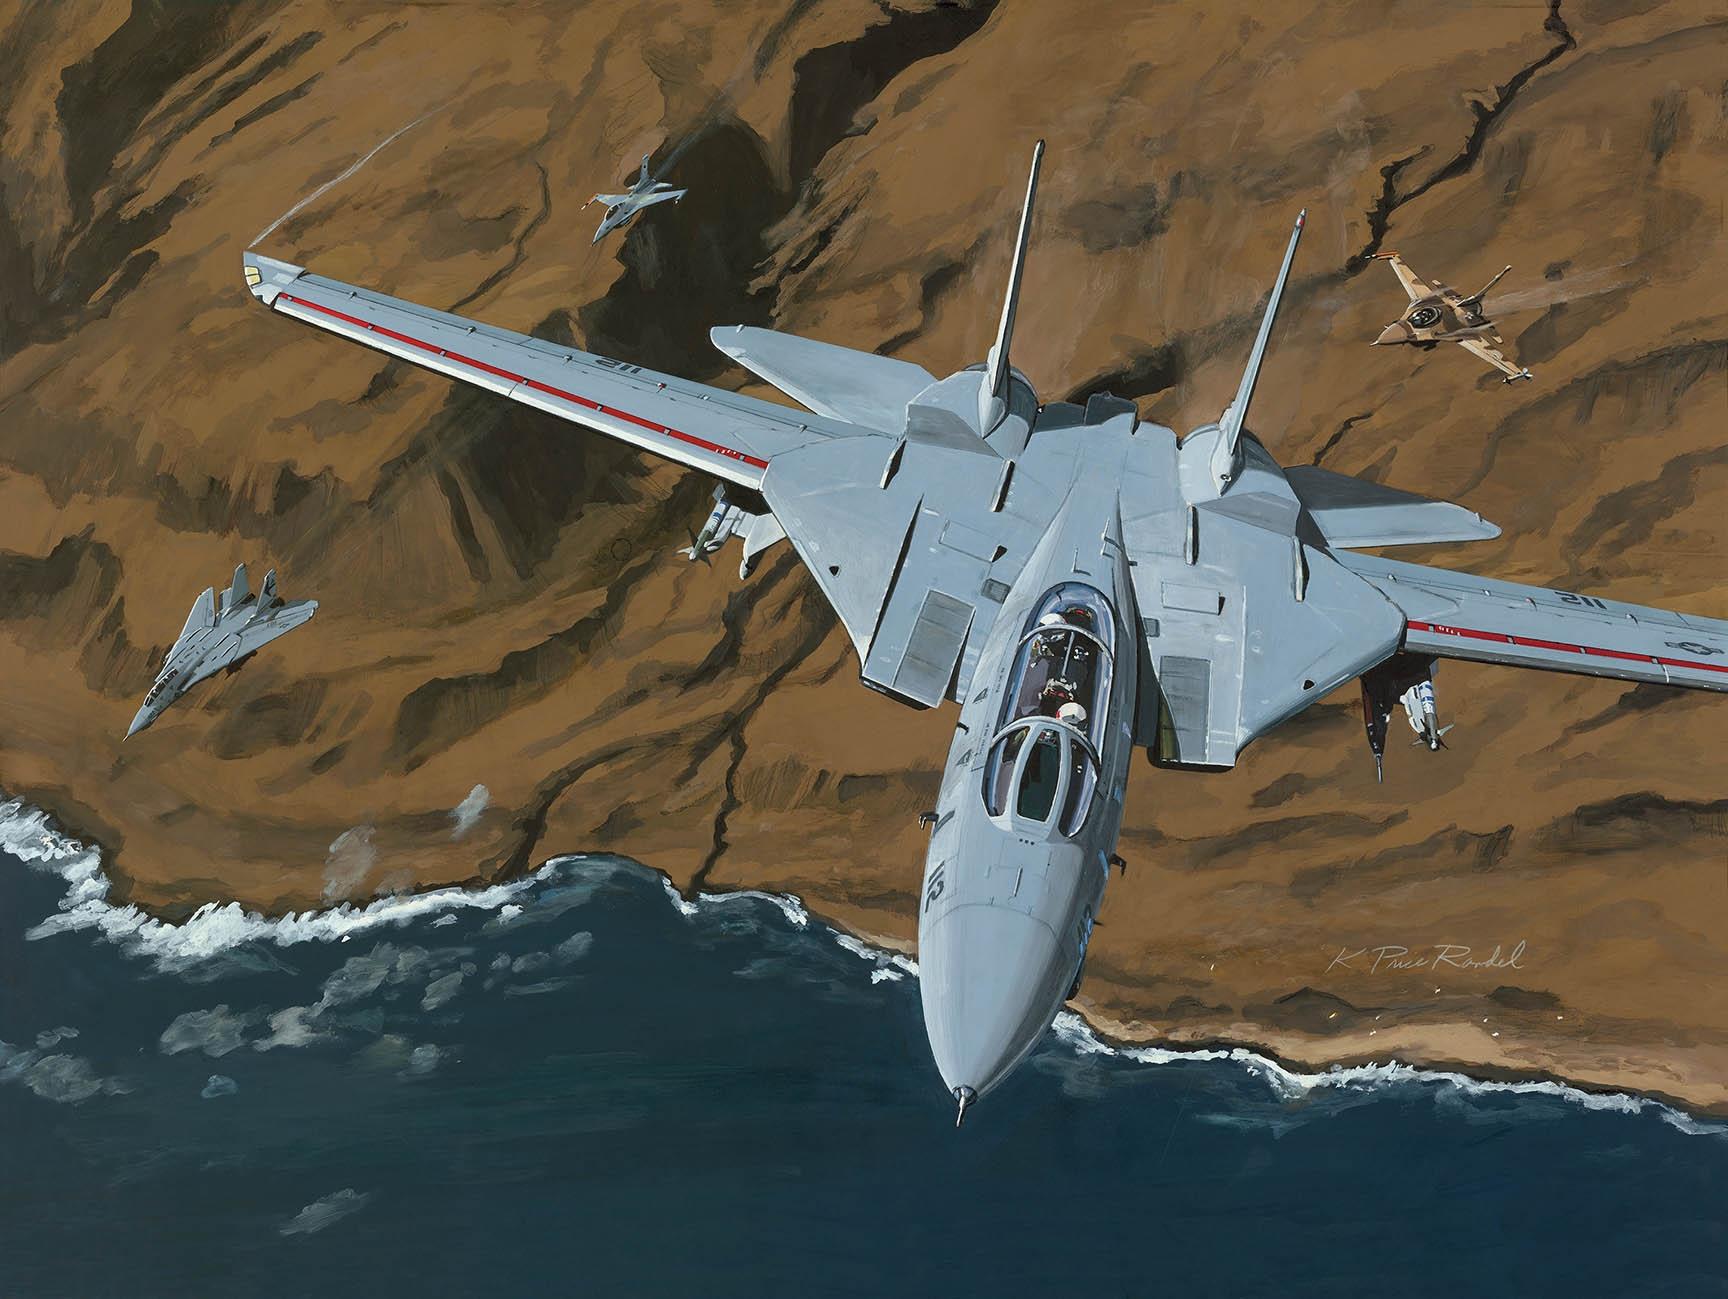 F-14 Tomcat Fine Art Prints